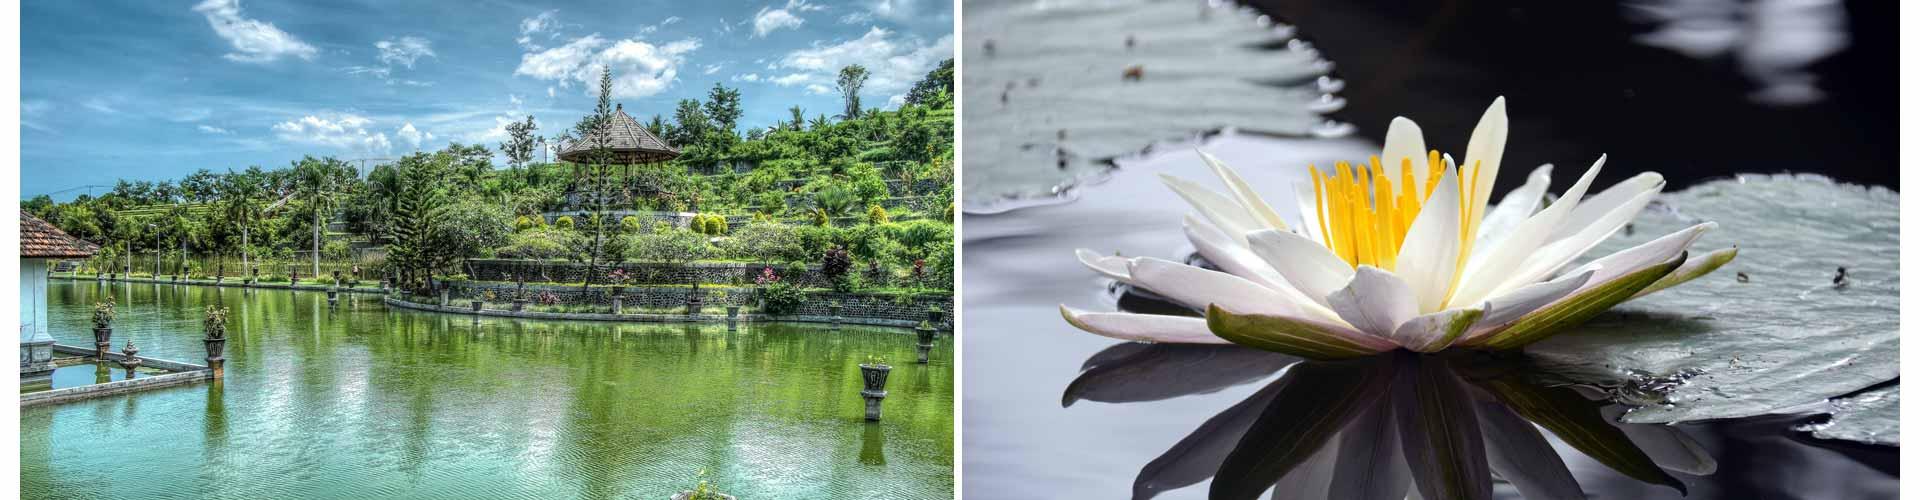 reisetagebuch bali lotus